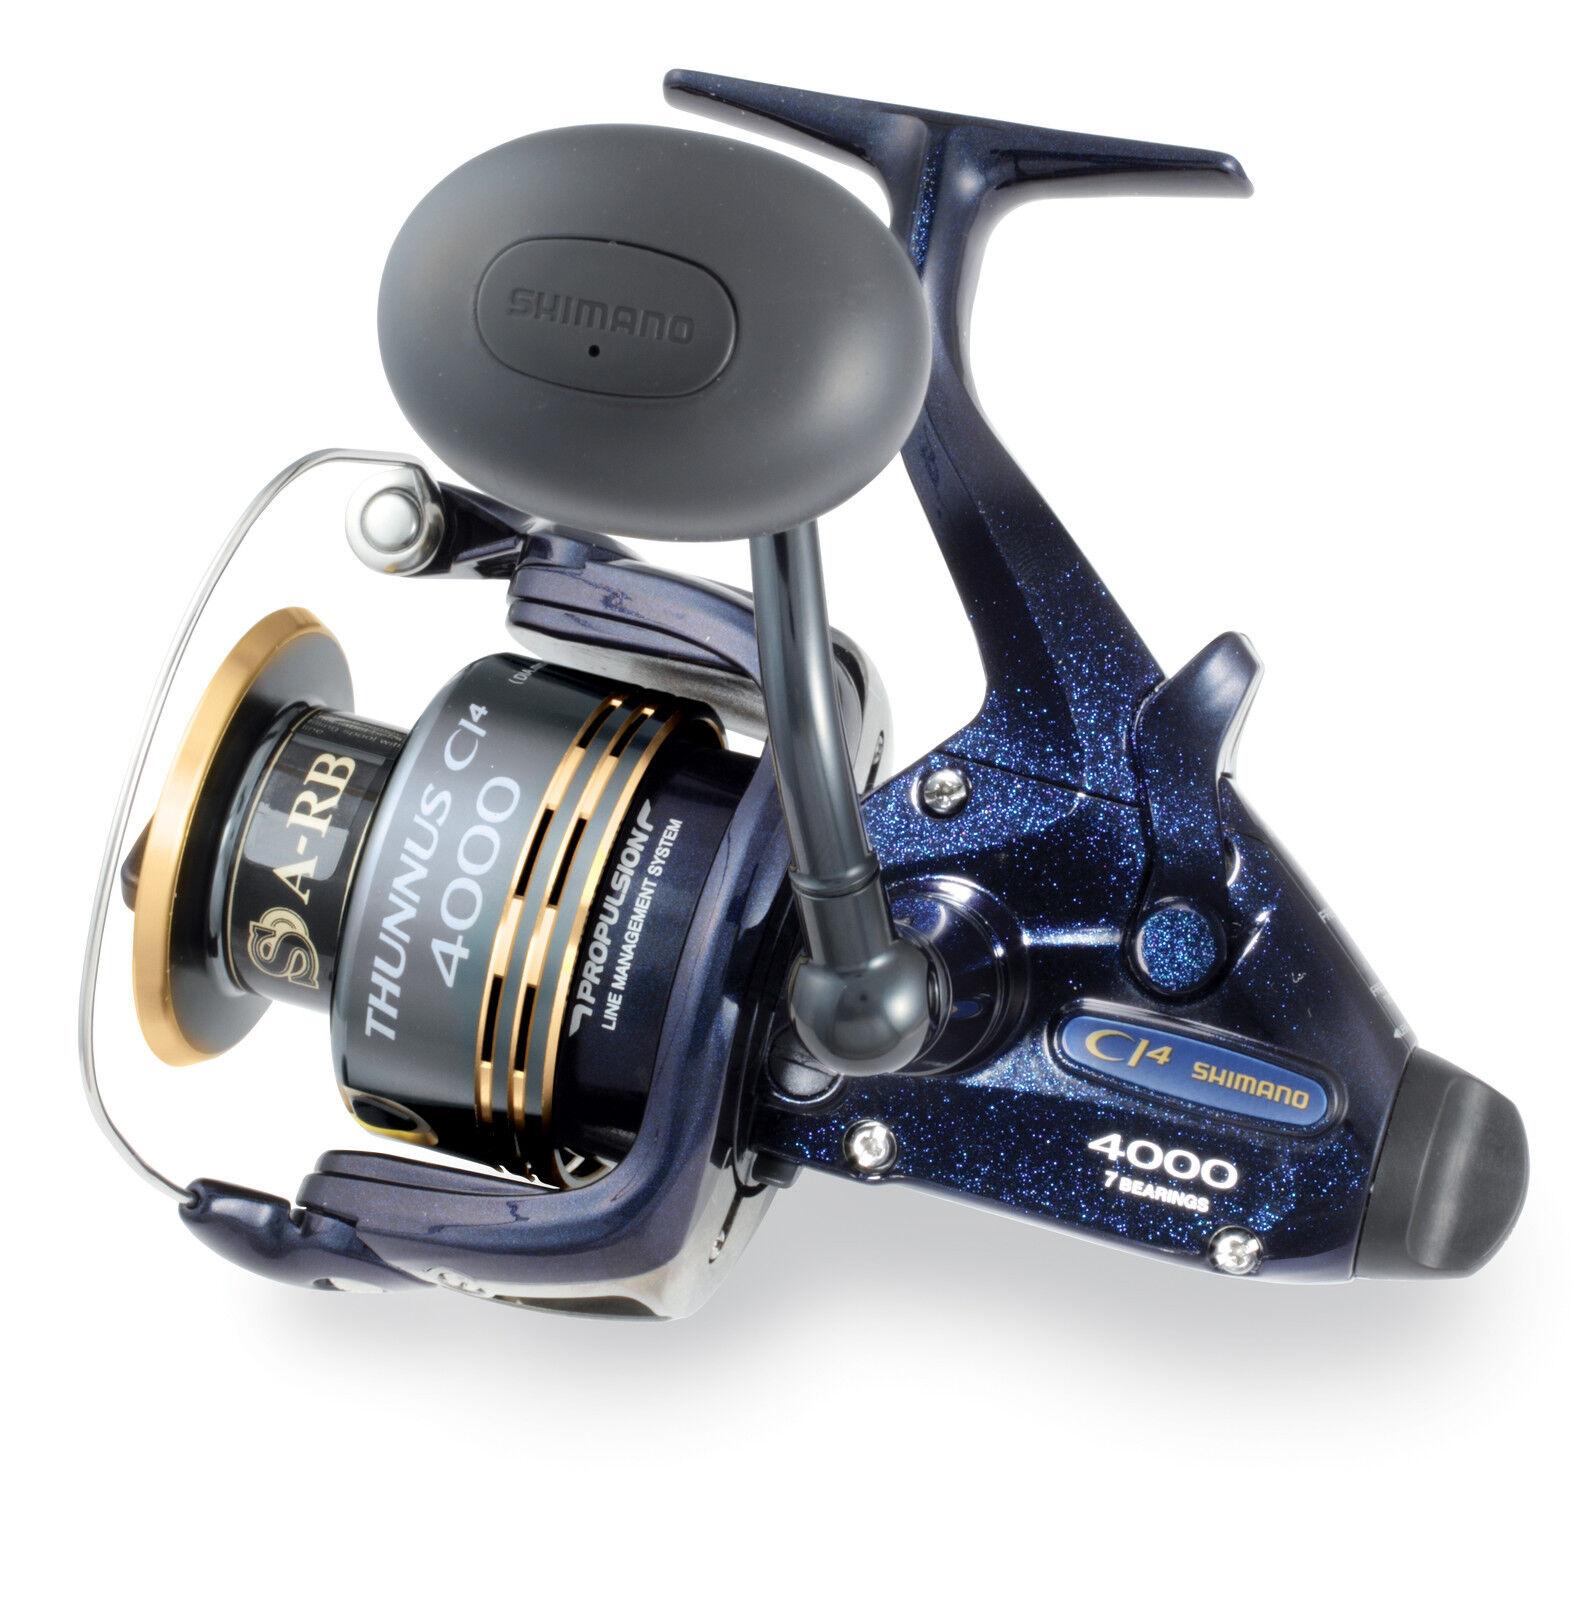 Shimano Thunnus CI4 4000 Spinning Reel TU4000CI4 -  FREE SHIPPING -  100% authentic